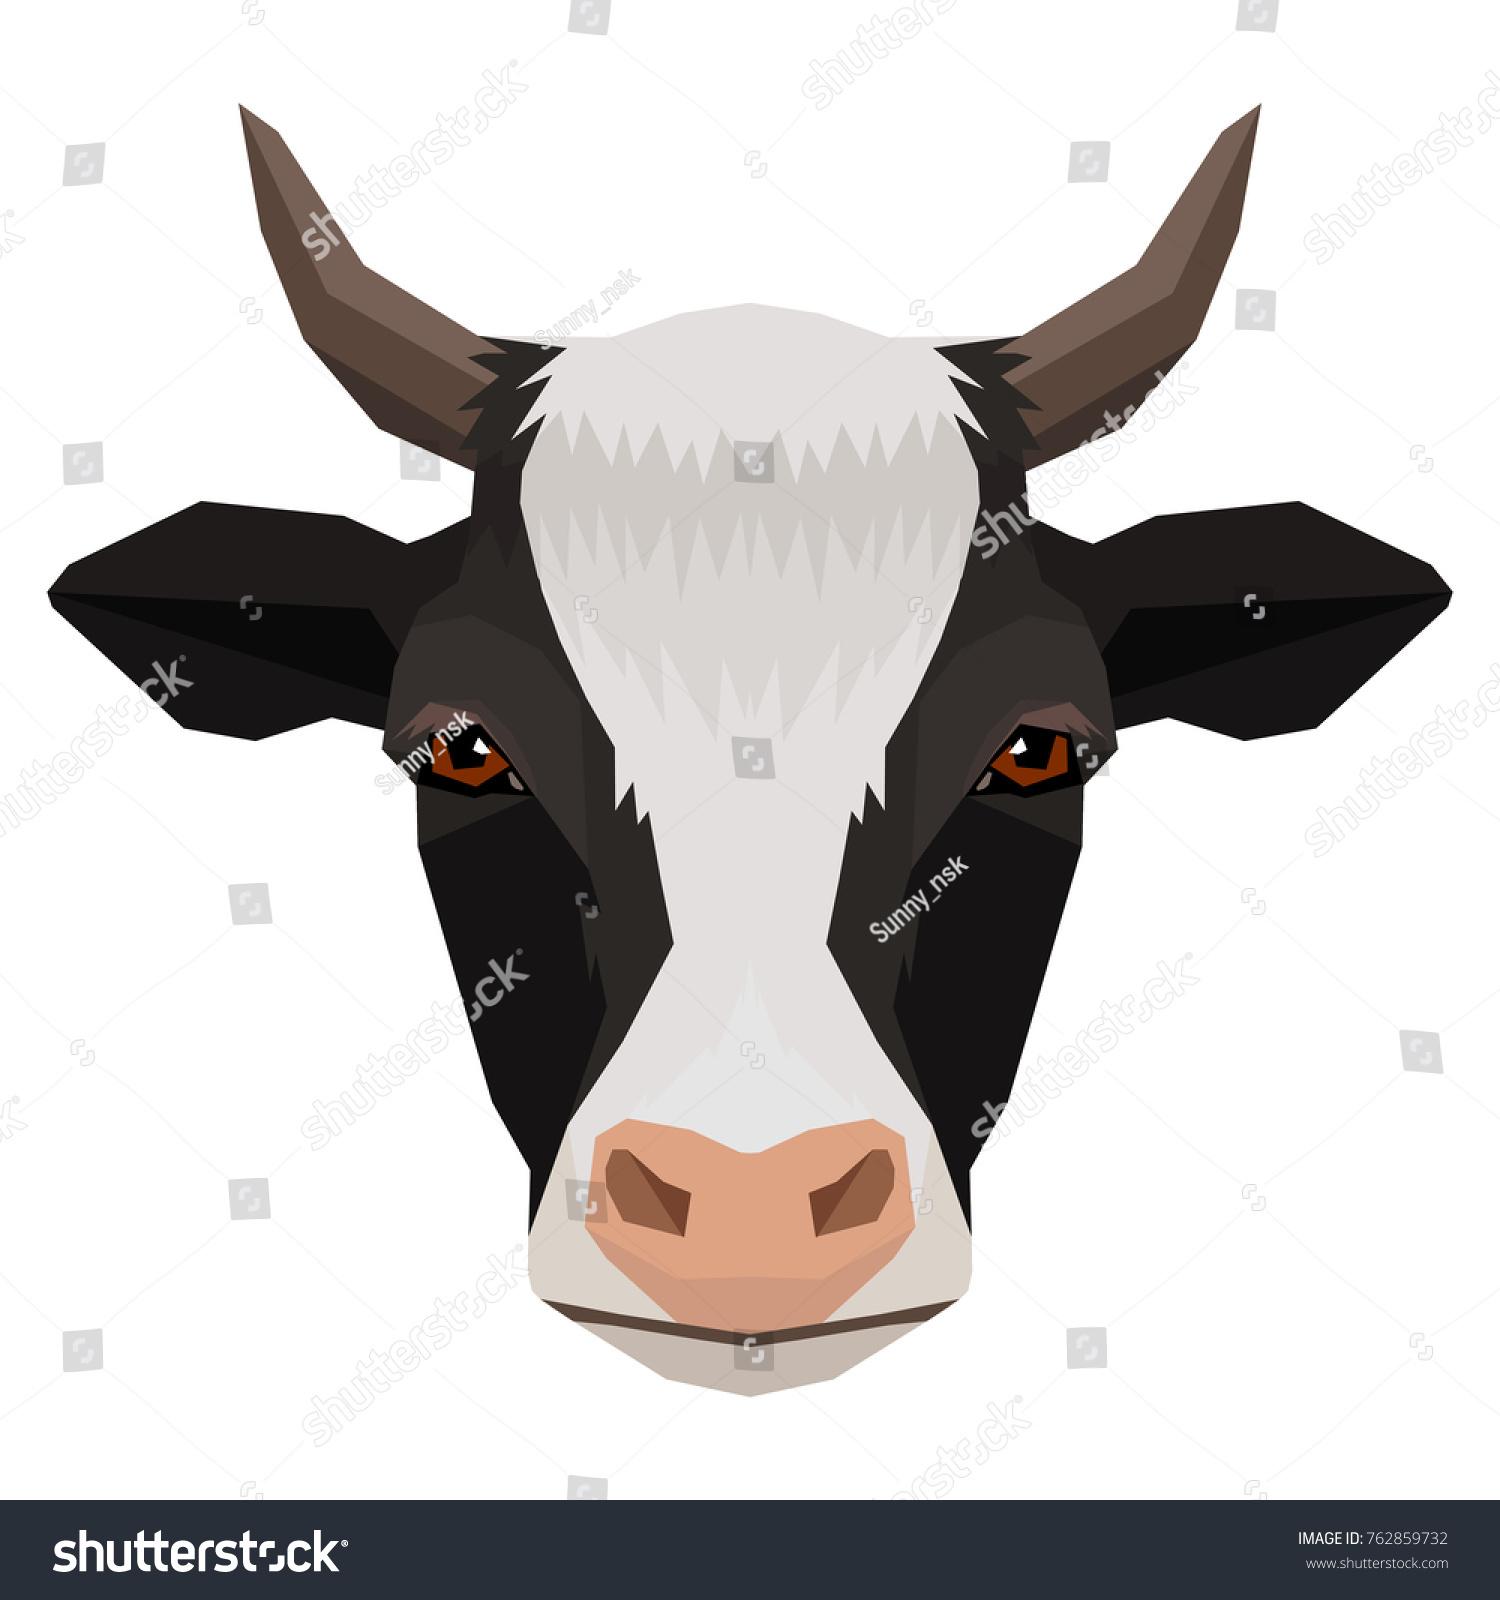 Vector Corner Style Cow Face Farm Stock Vector 762859732 - Shutterstock